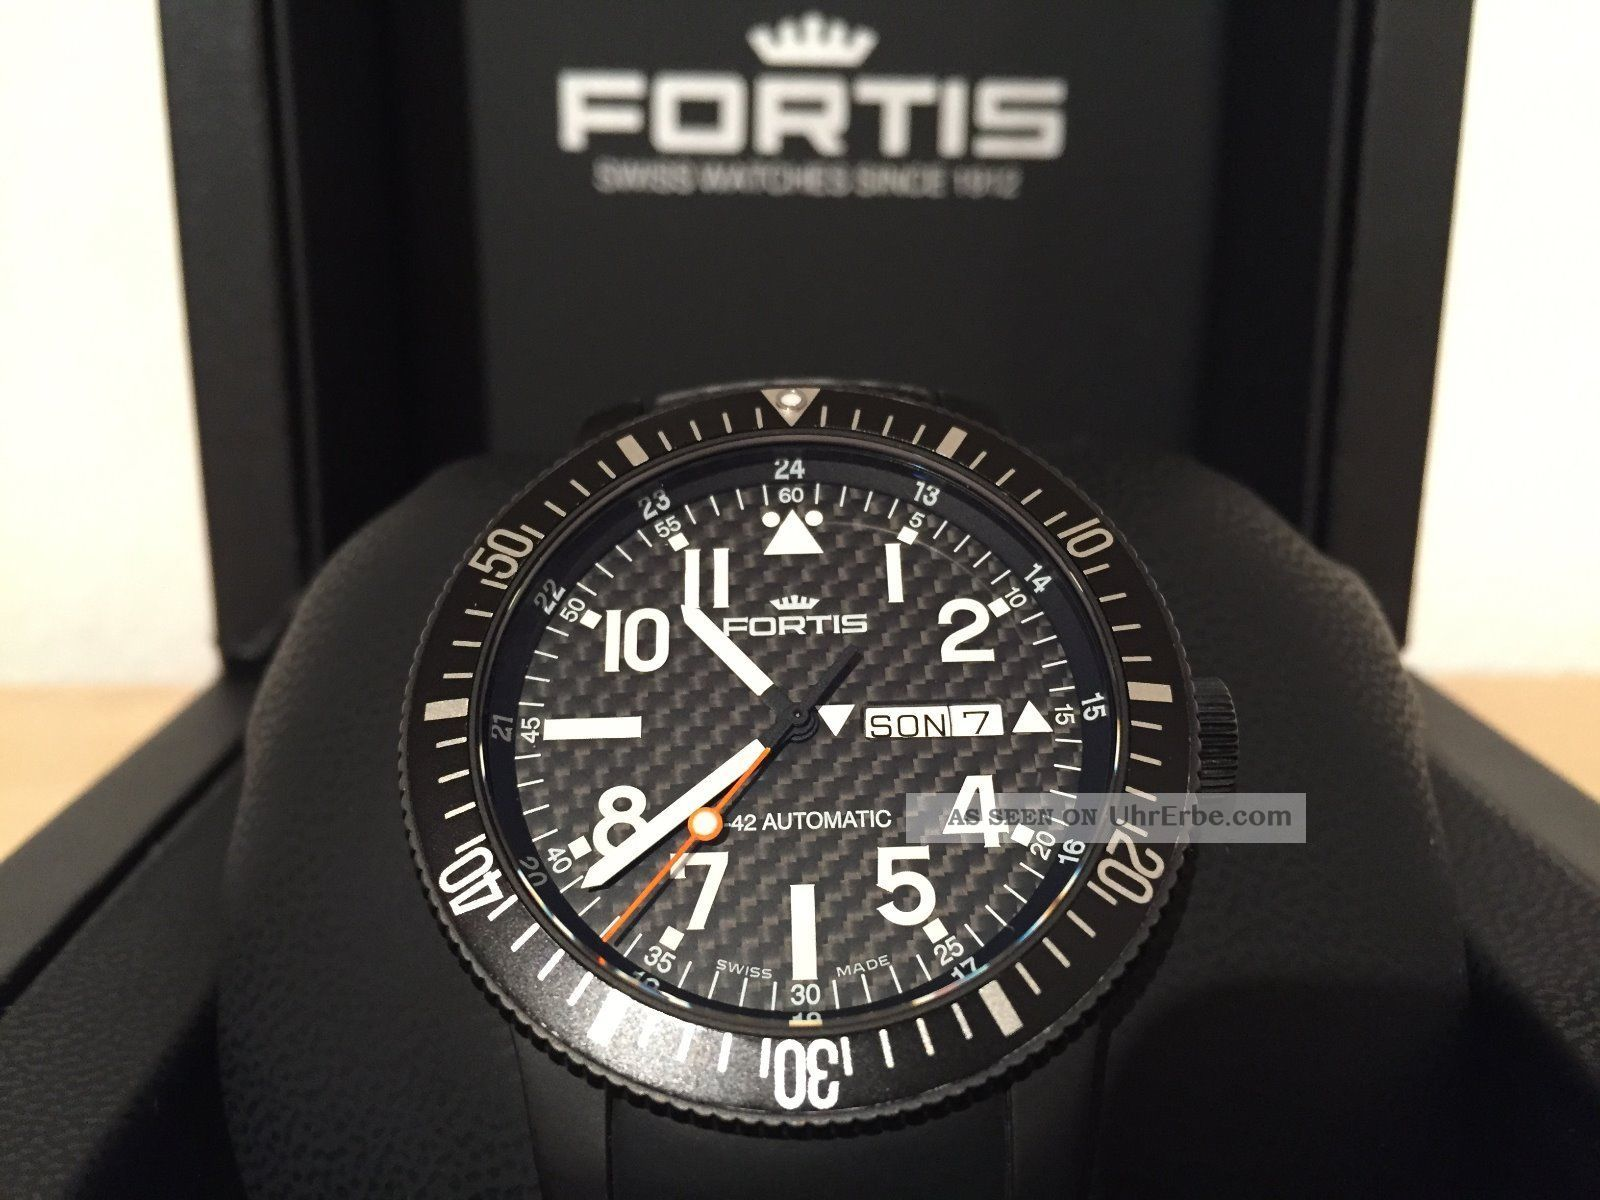 Fortis B - 42 Black Automatic Titan Pvd Cosmonauts 647.  28.  71 Top Armbanduhren Bild